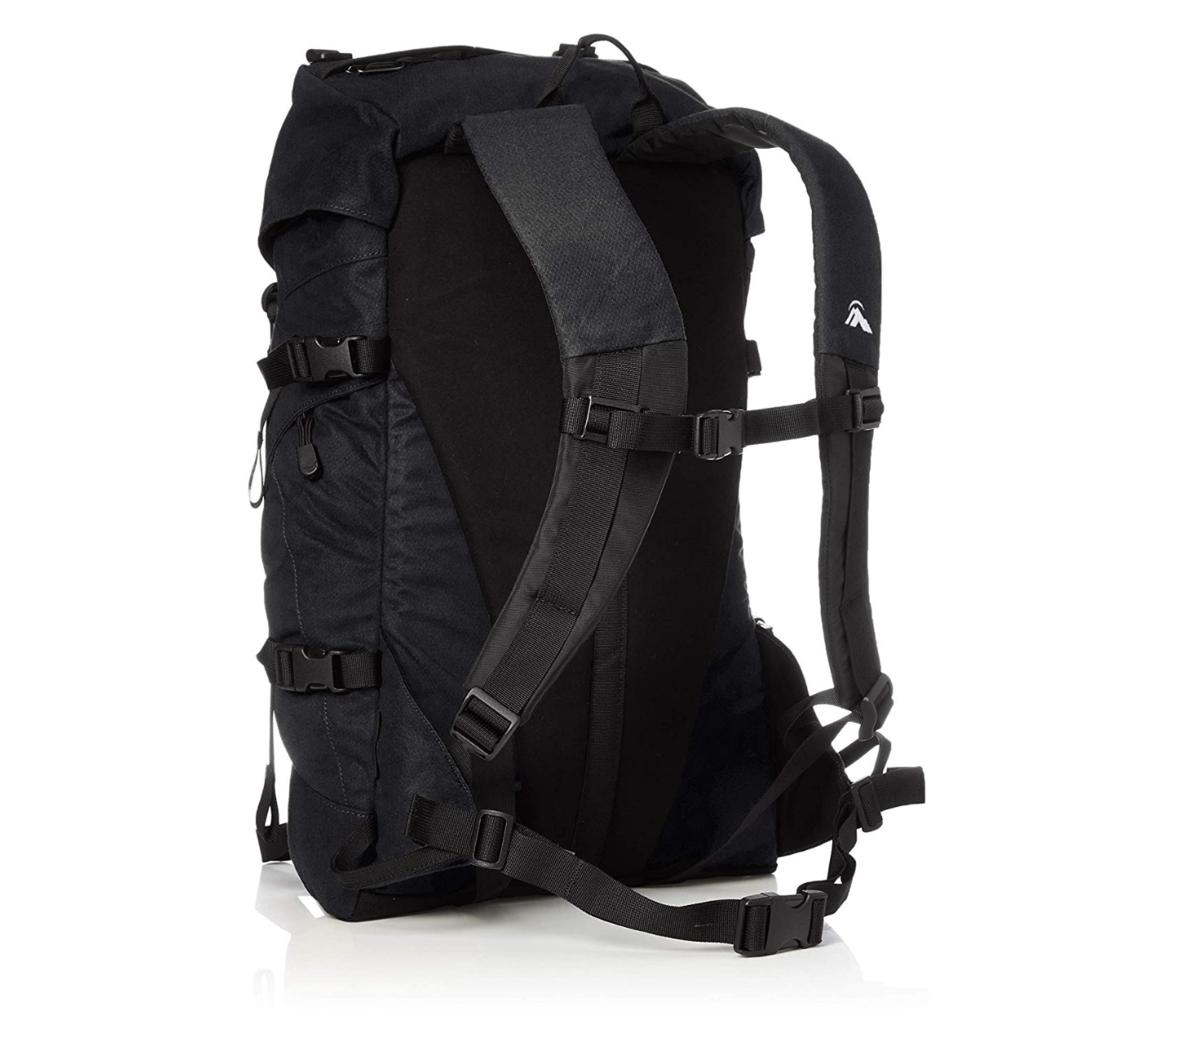 f:id:thebackpack:20191007192147p:plain